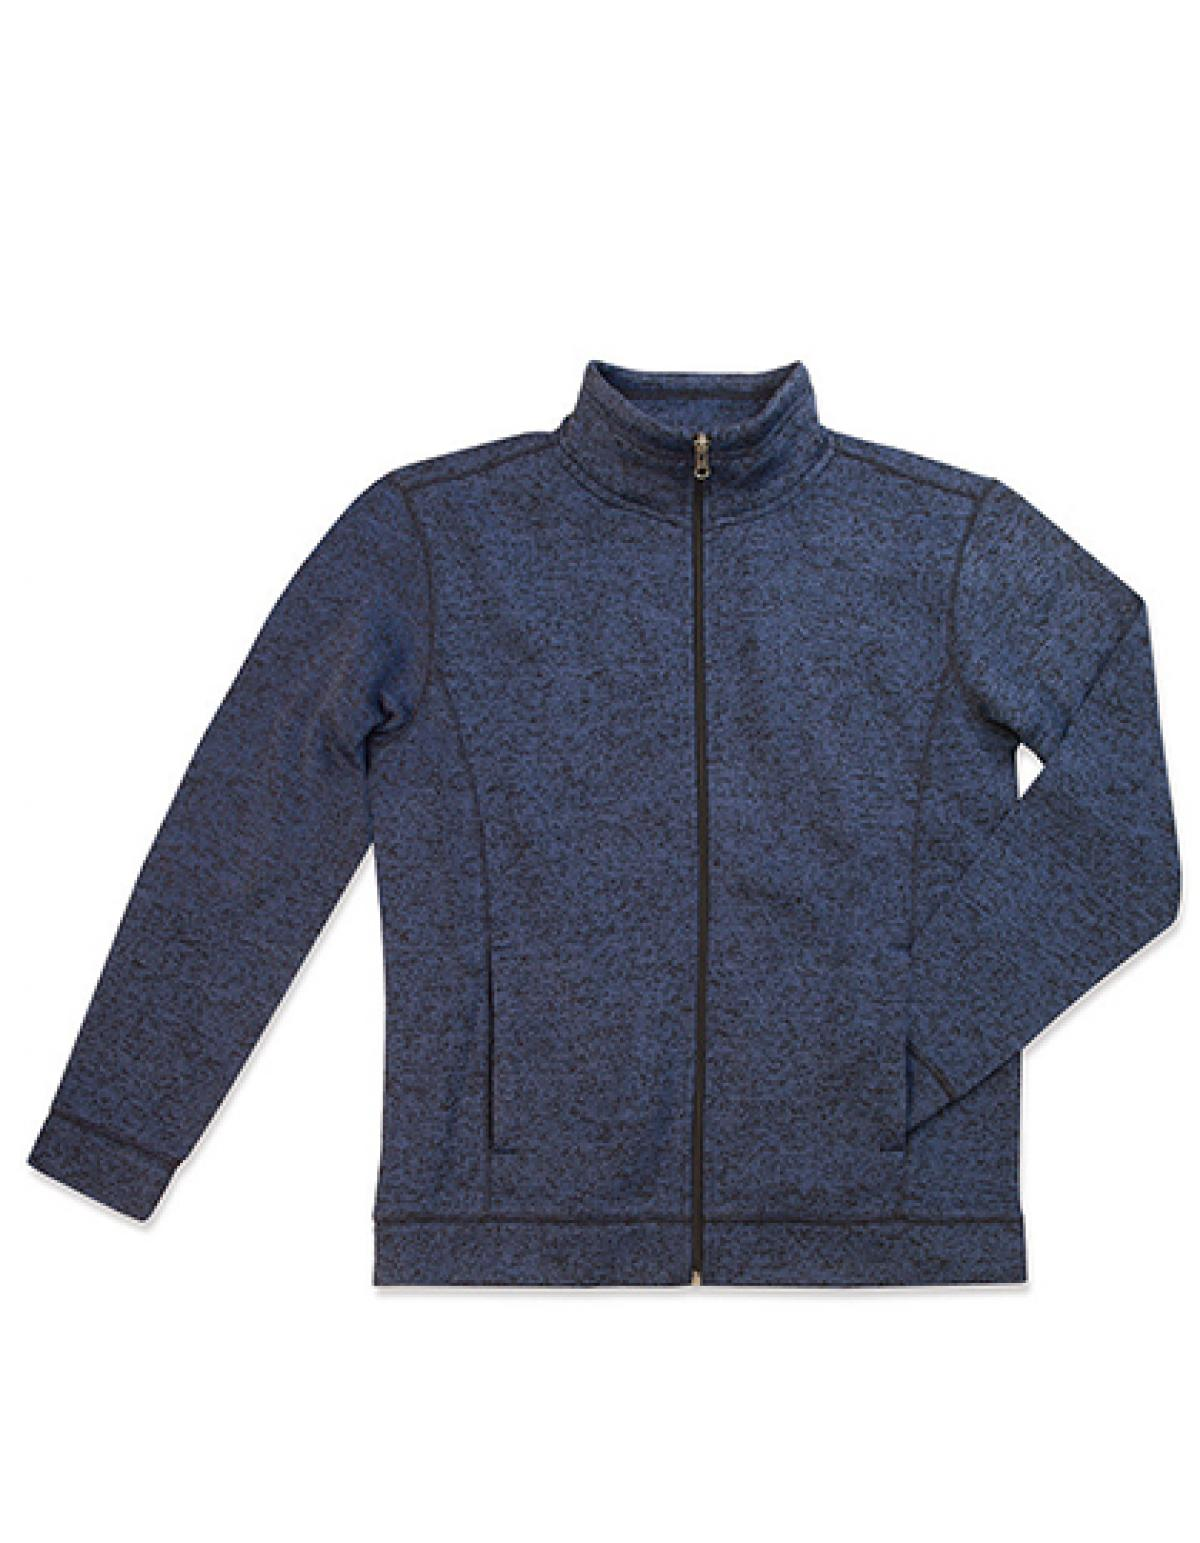 active knit herren fleece jacke mit stehkragen rexlander s. Black Bedroom Furniture Sets. Home Design Ideas